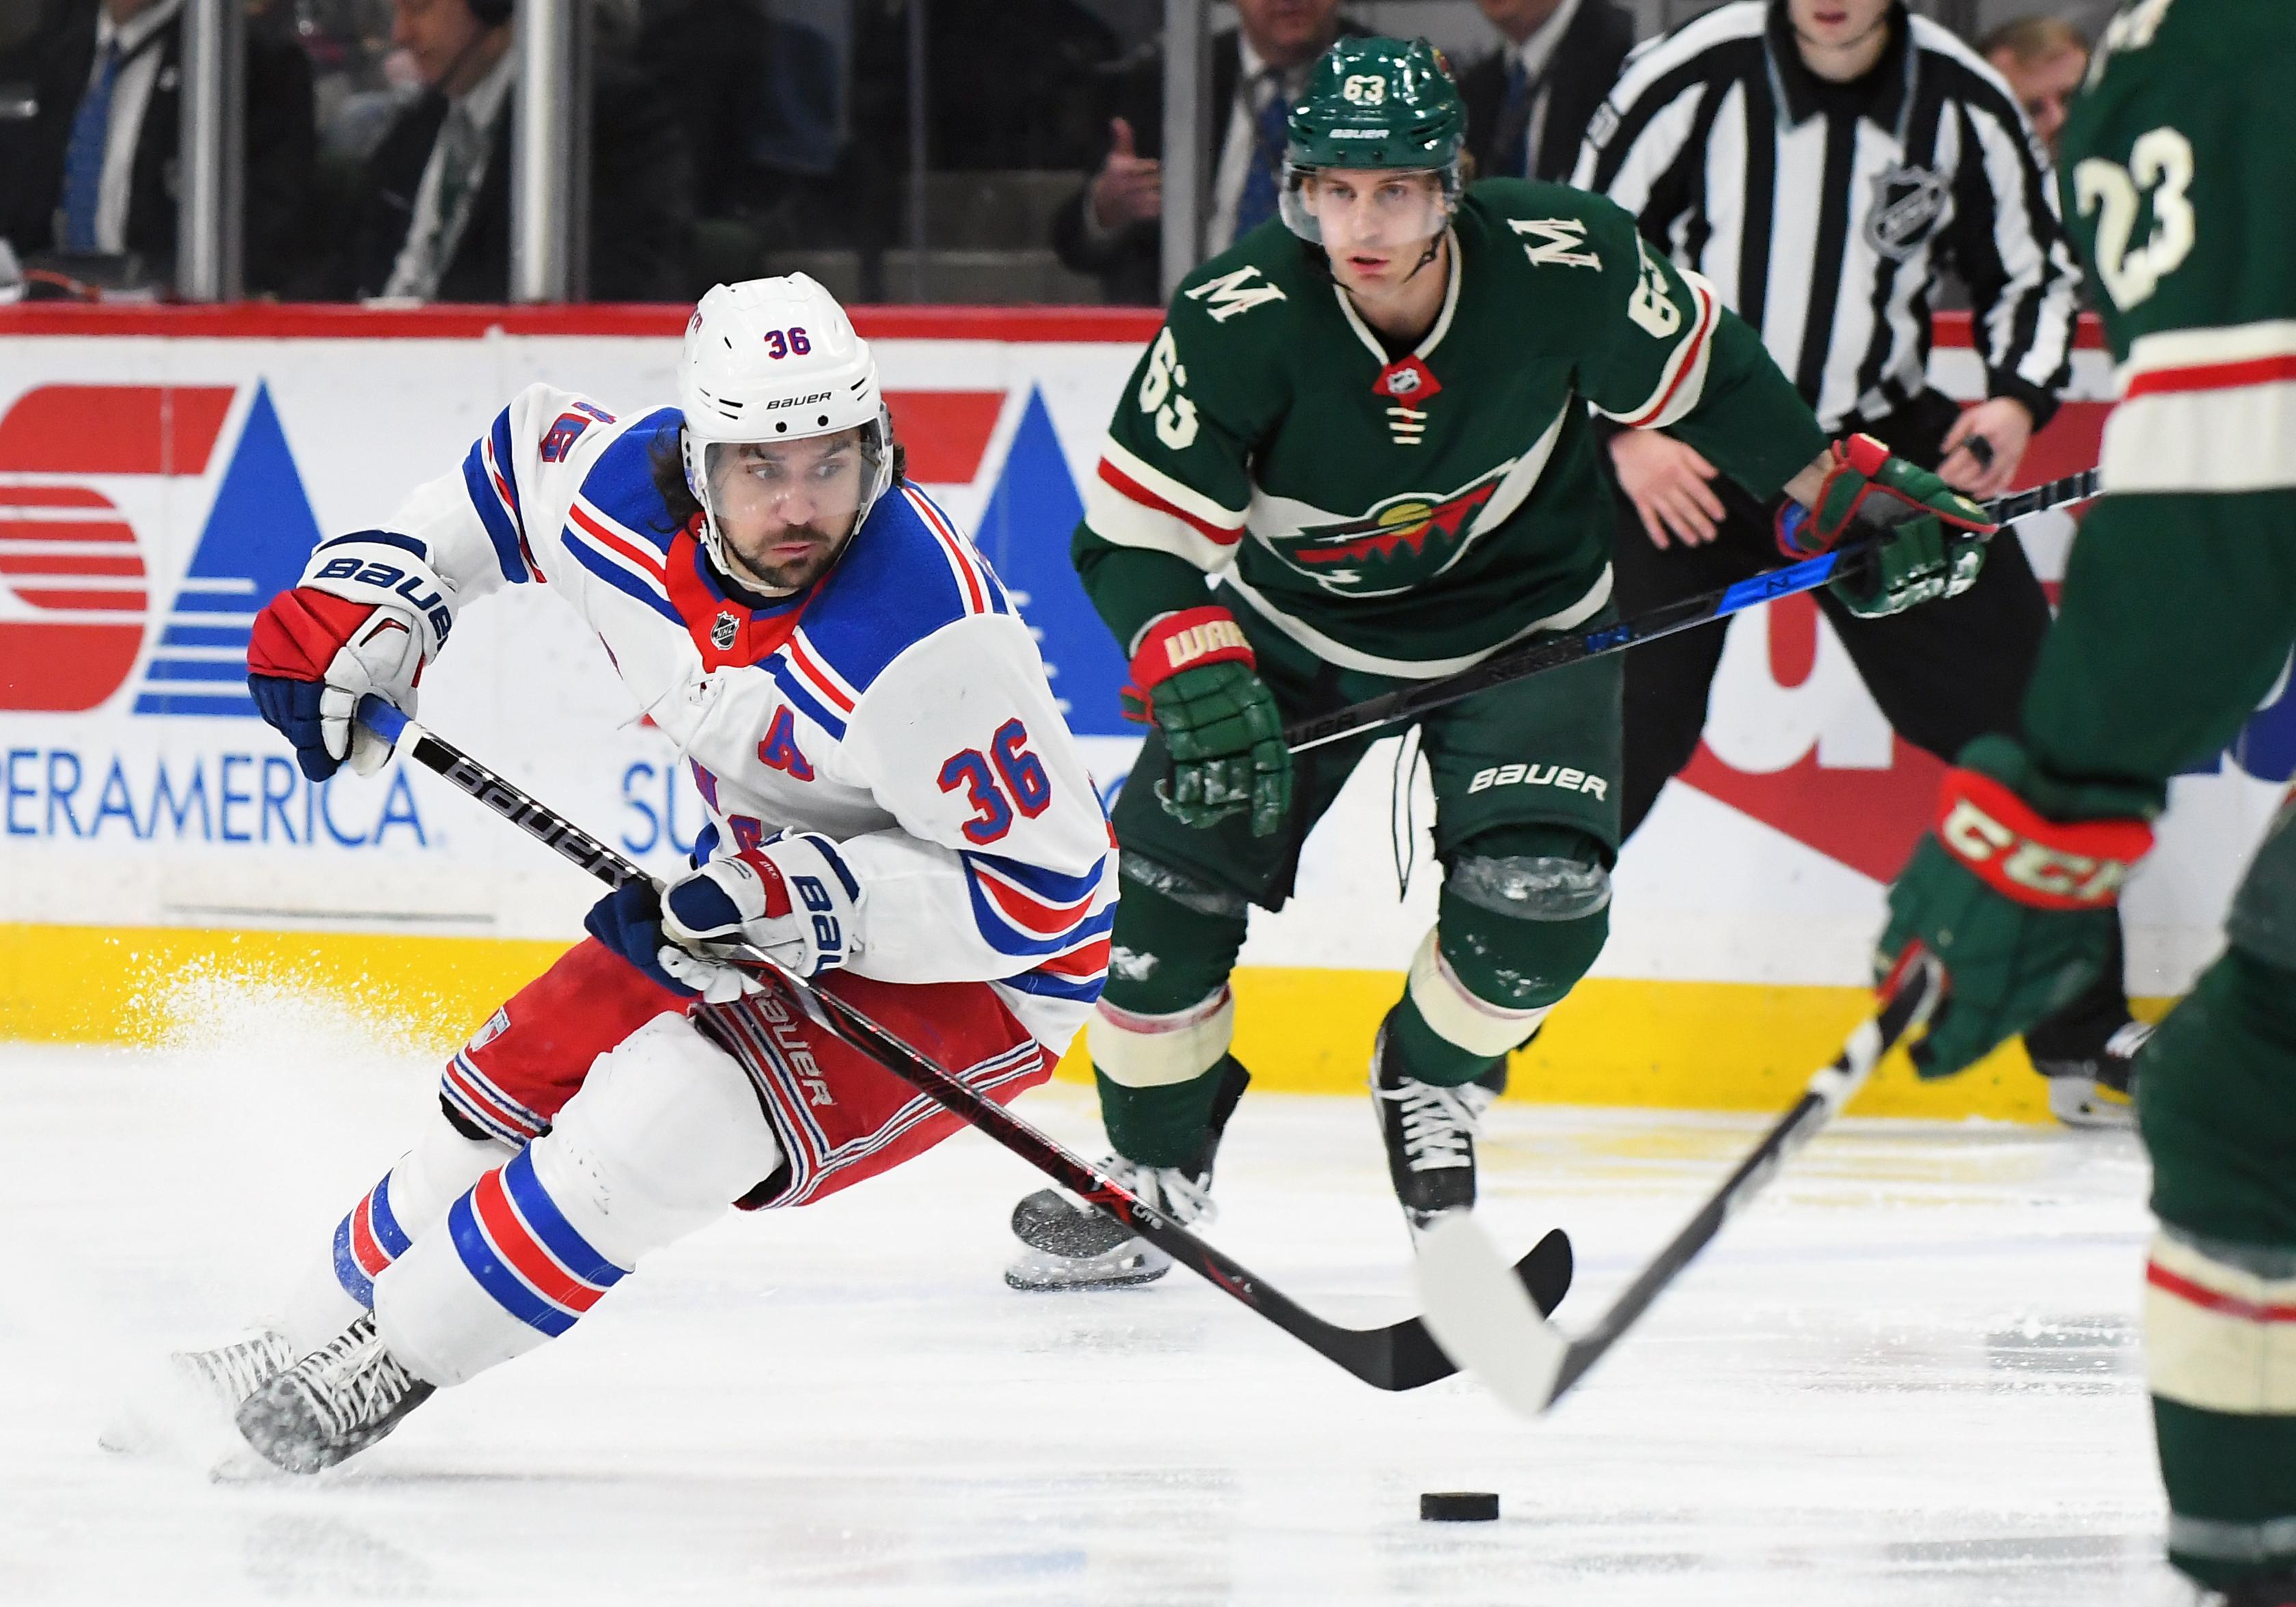 NHL: FEB 13 Rangers at Wild